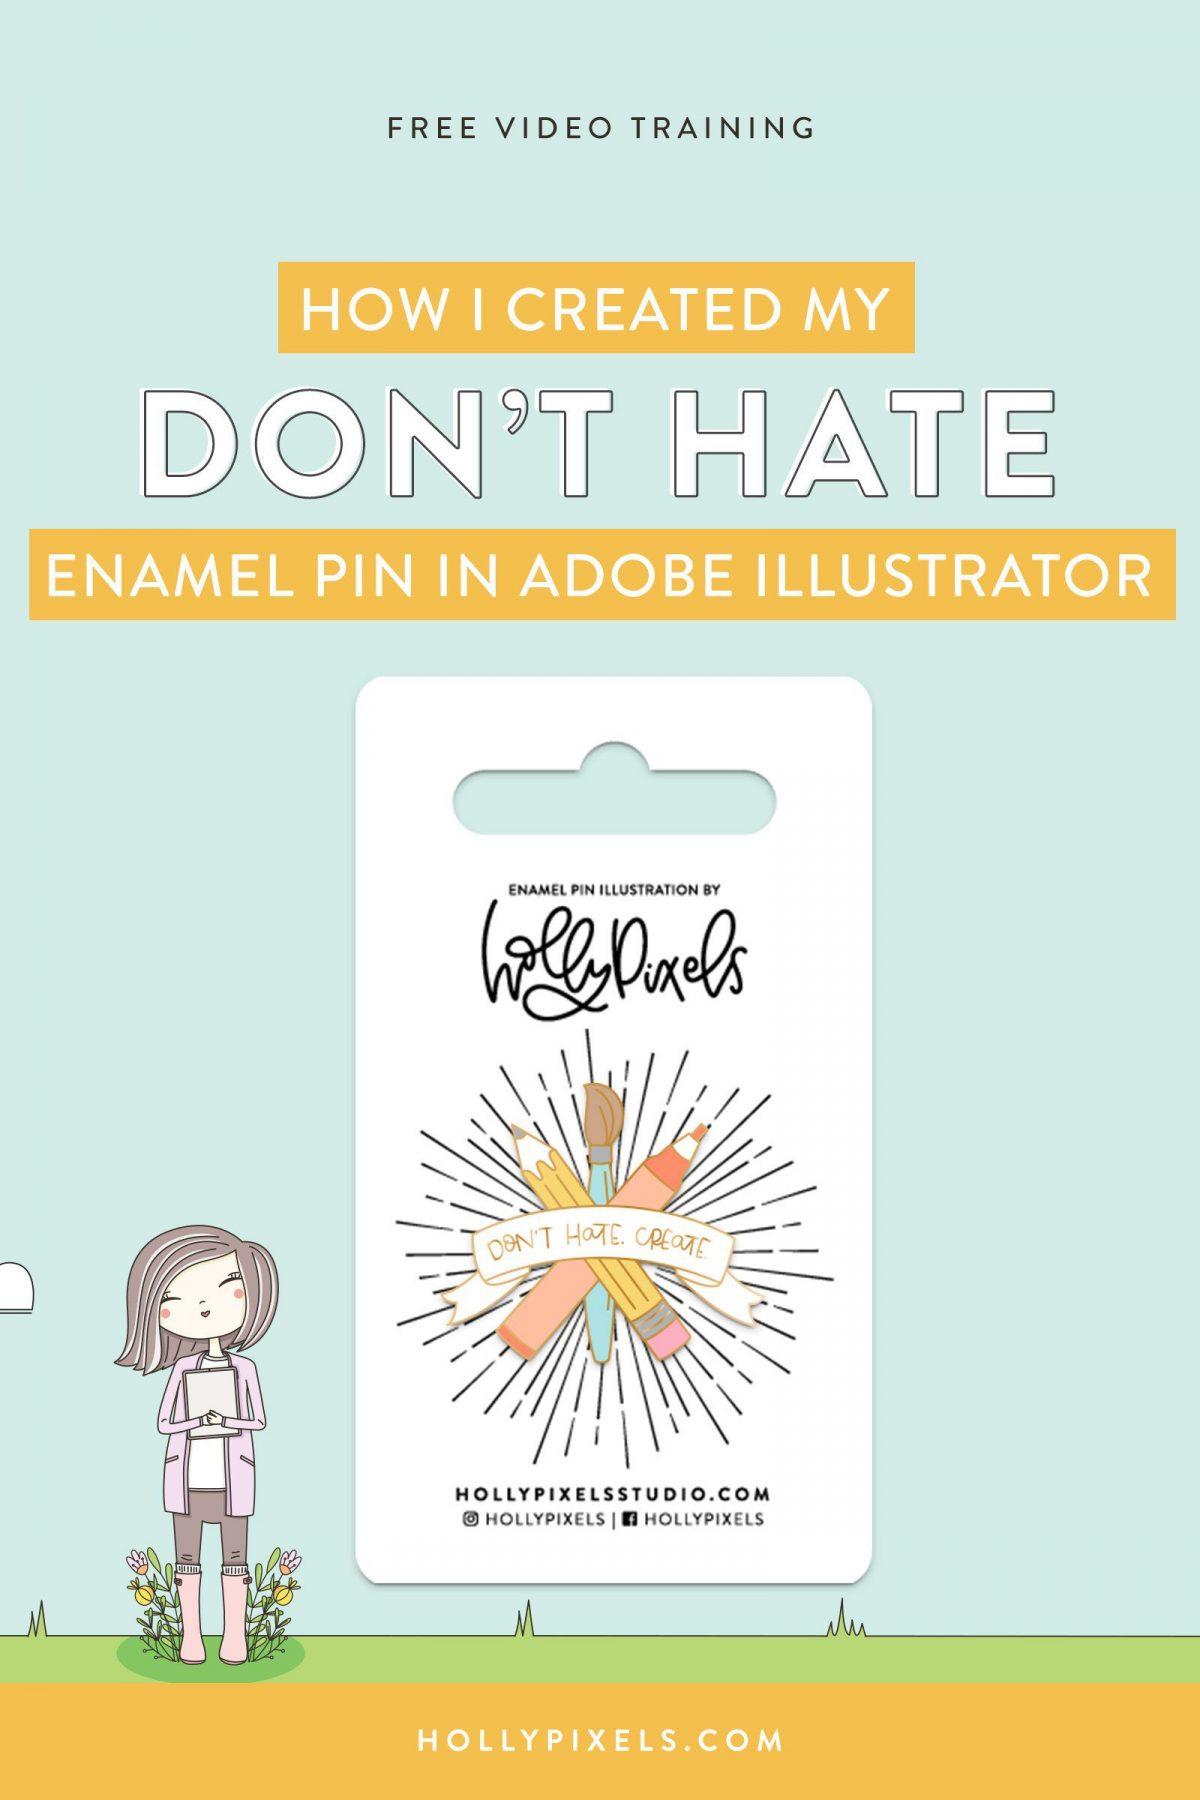 Creating My Don't Hate Create Enamel Pin in Adobe Illustrator